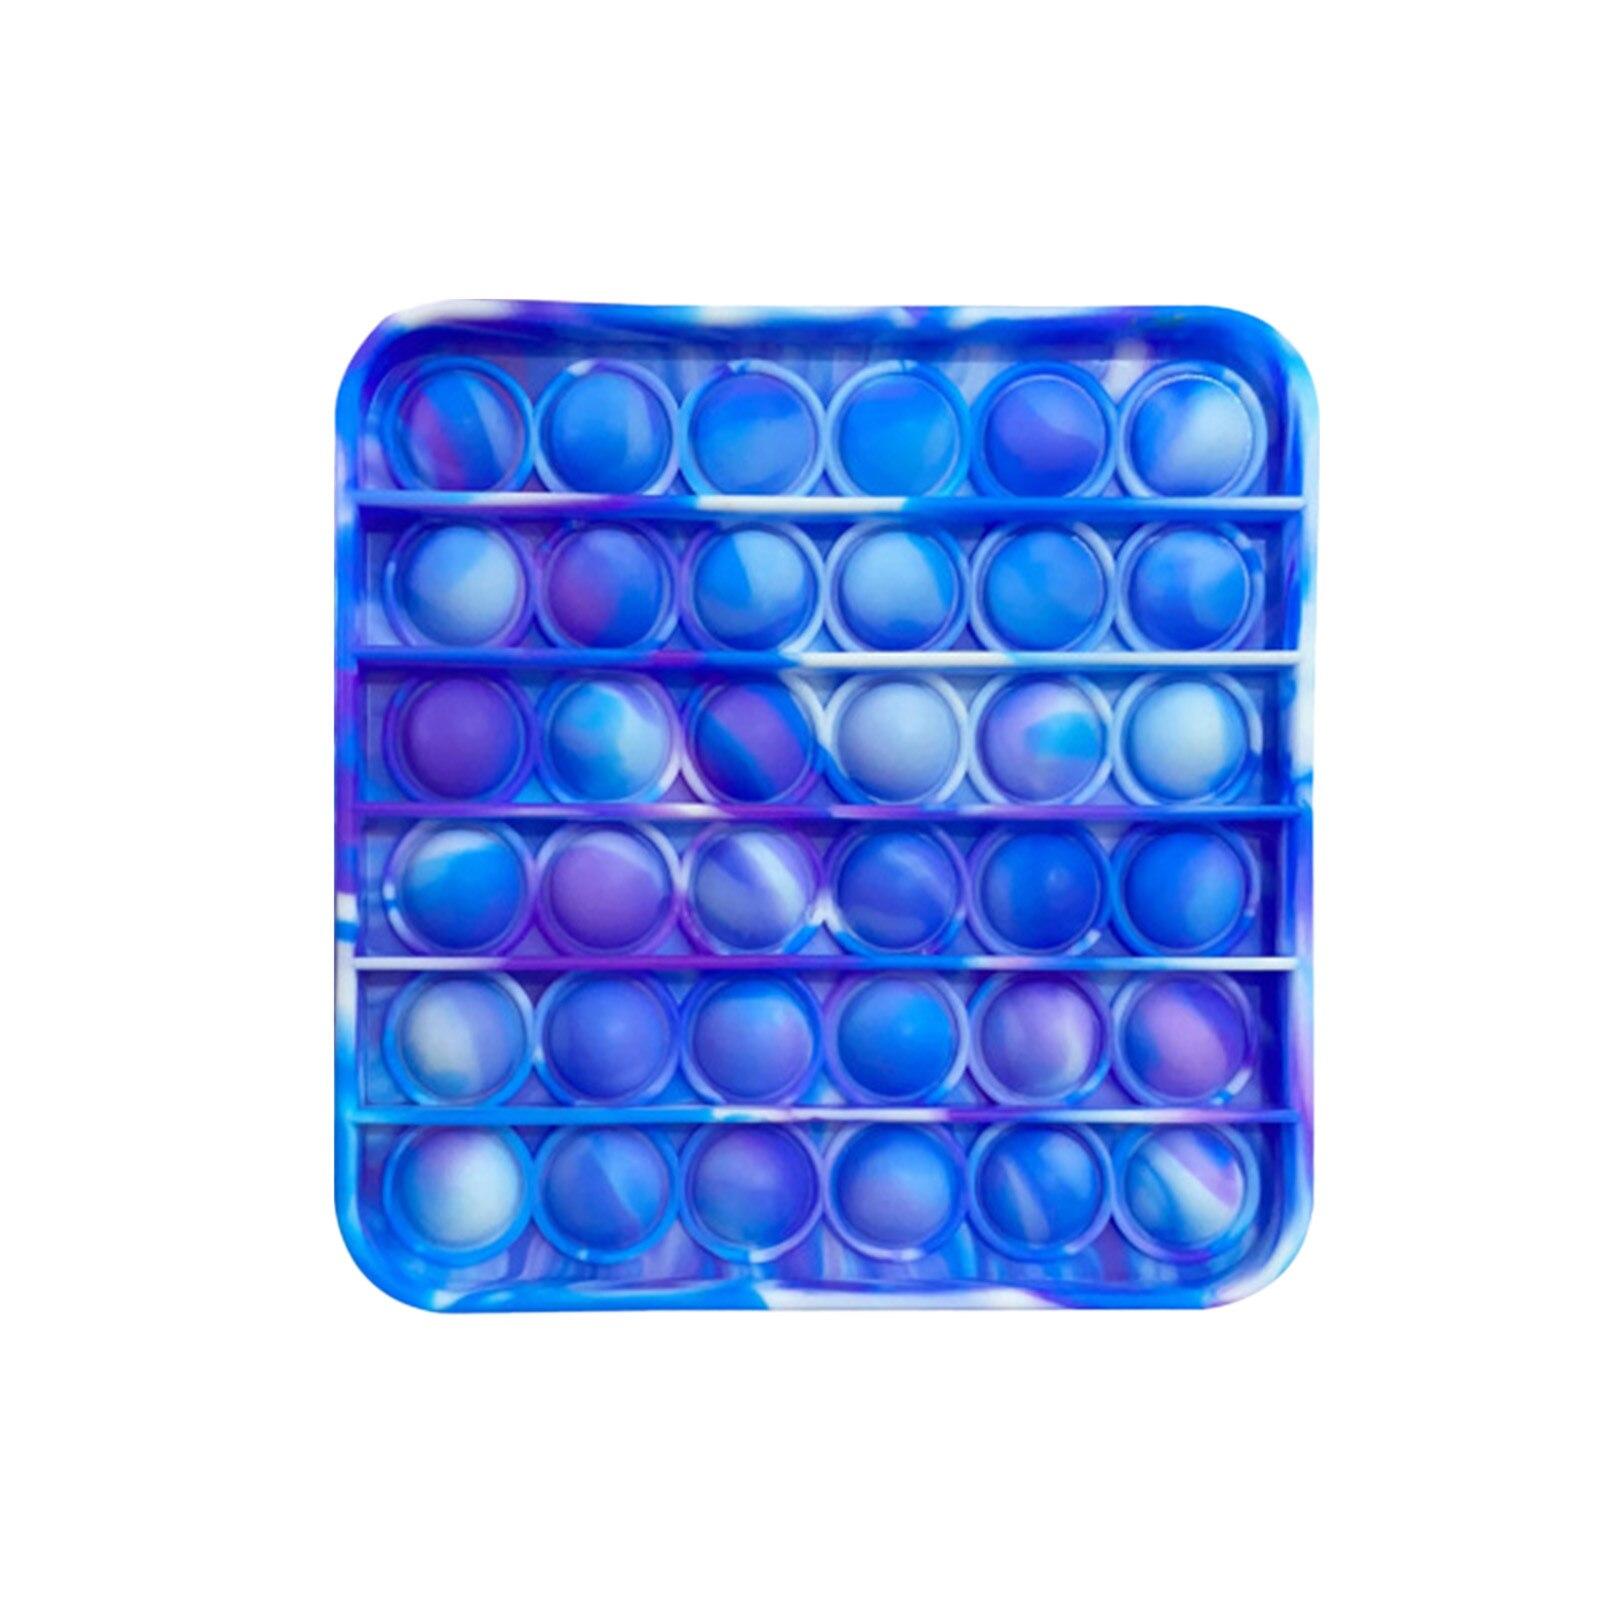 Poppit Toy Fidget-Toys Sensory-Toy Autism Gift Bubble-Pop Stress Reliever Funny Kids img5